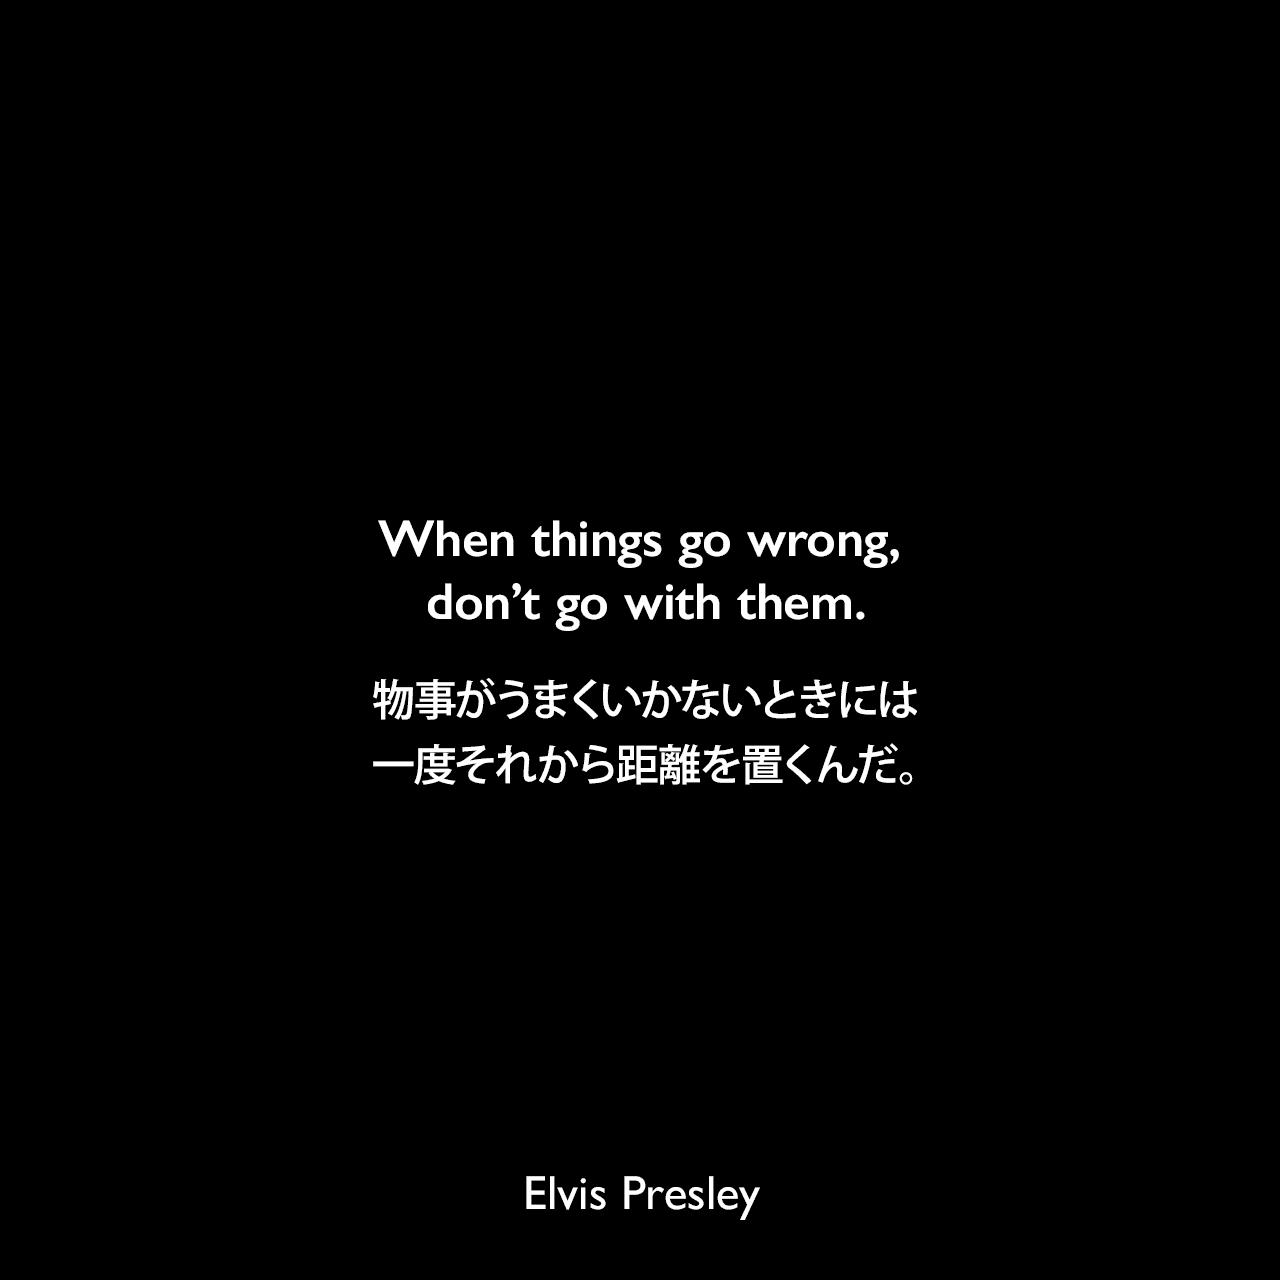 When things go wrong, don't go with them.物事がうまくいかないときには、一度それから距離を置くんだ。Elvis Presley